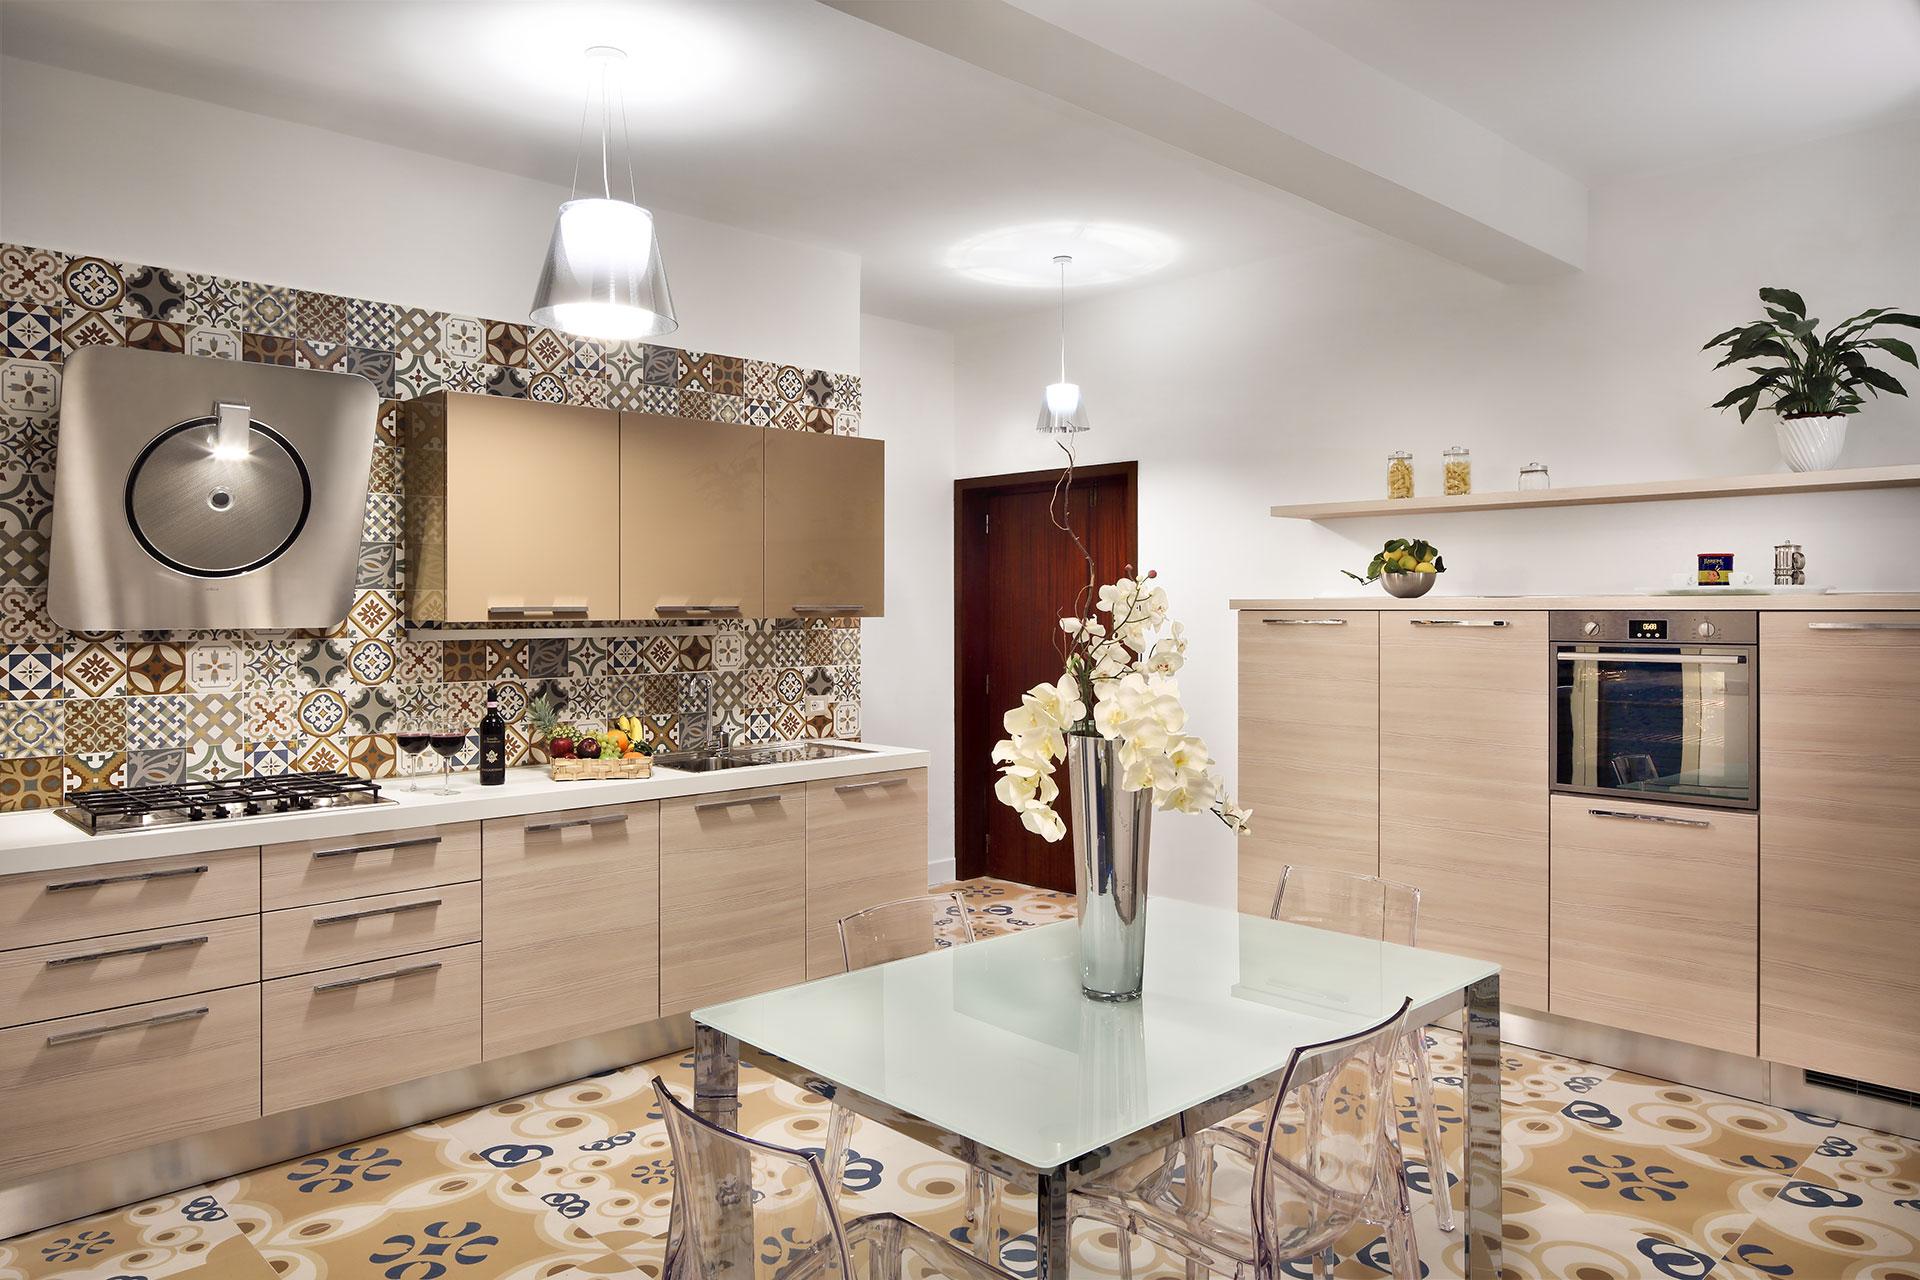 Apartment Sorrento Urban Beta   Explore the delights of Sorrento photo 20144854